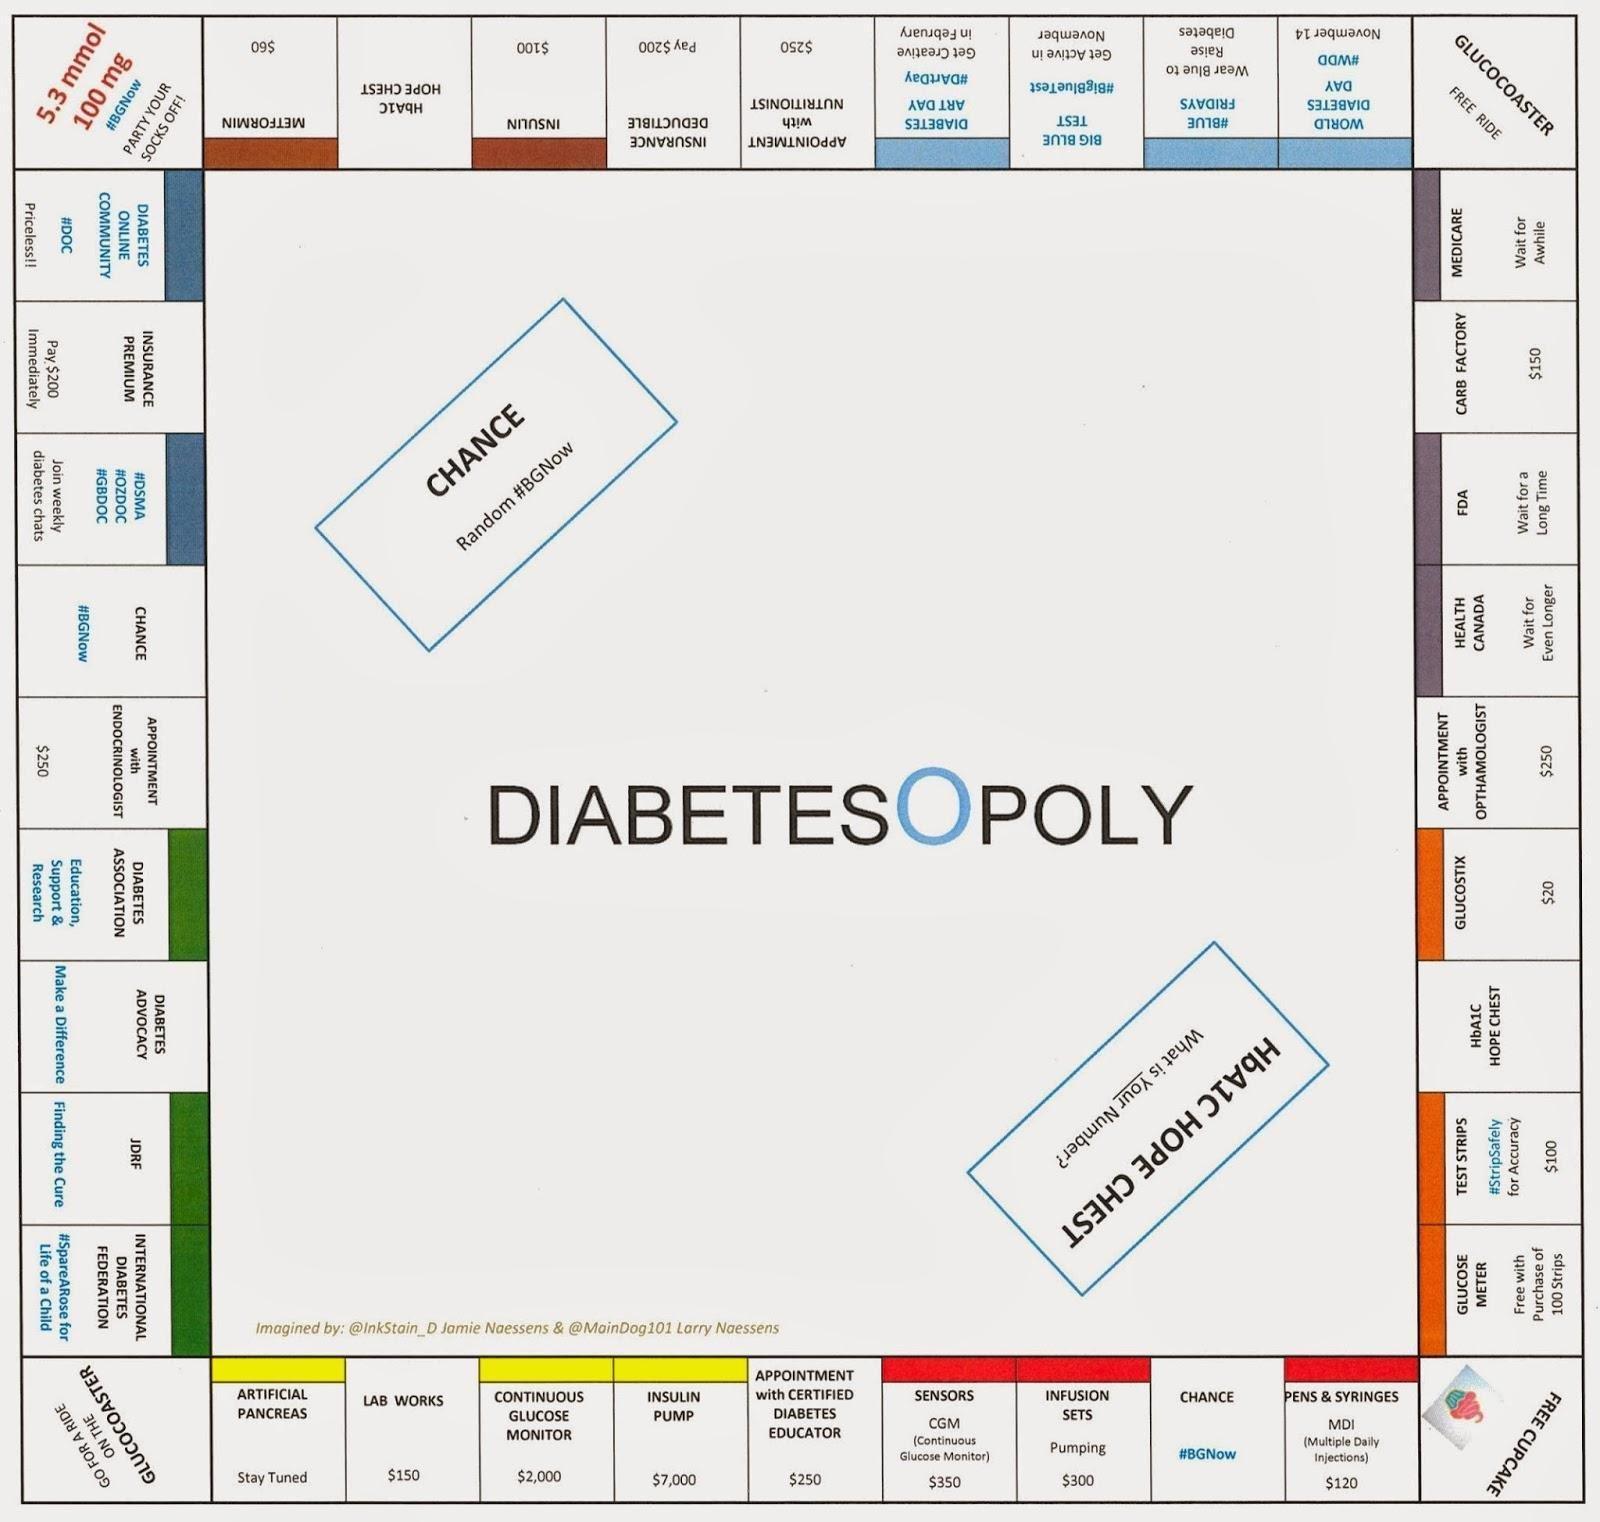 Diabetes Education Through Board Games A Good Idea Or A Trivial Pursuit?